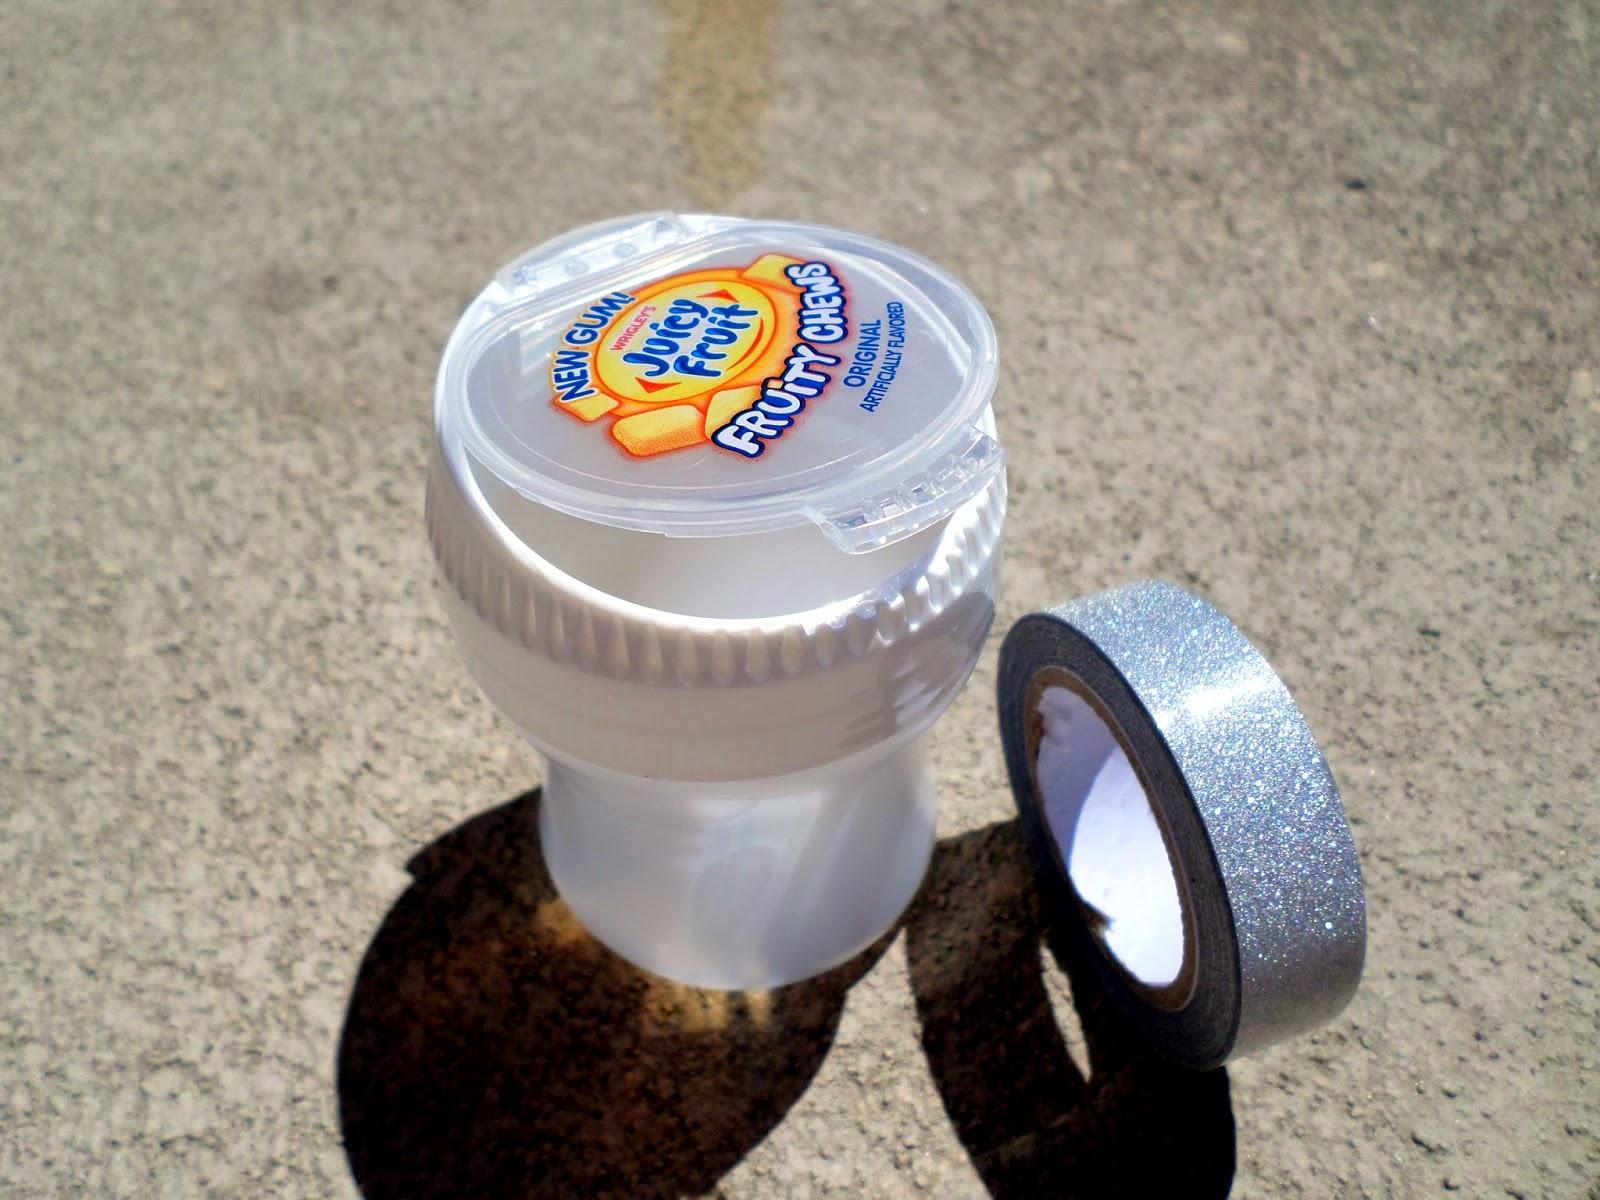 Summer Fun Juicy Fruit Gum Upcycled Container Washi Tape #JuicyFruitFunSide #shop